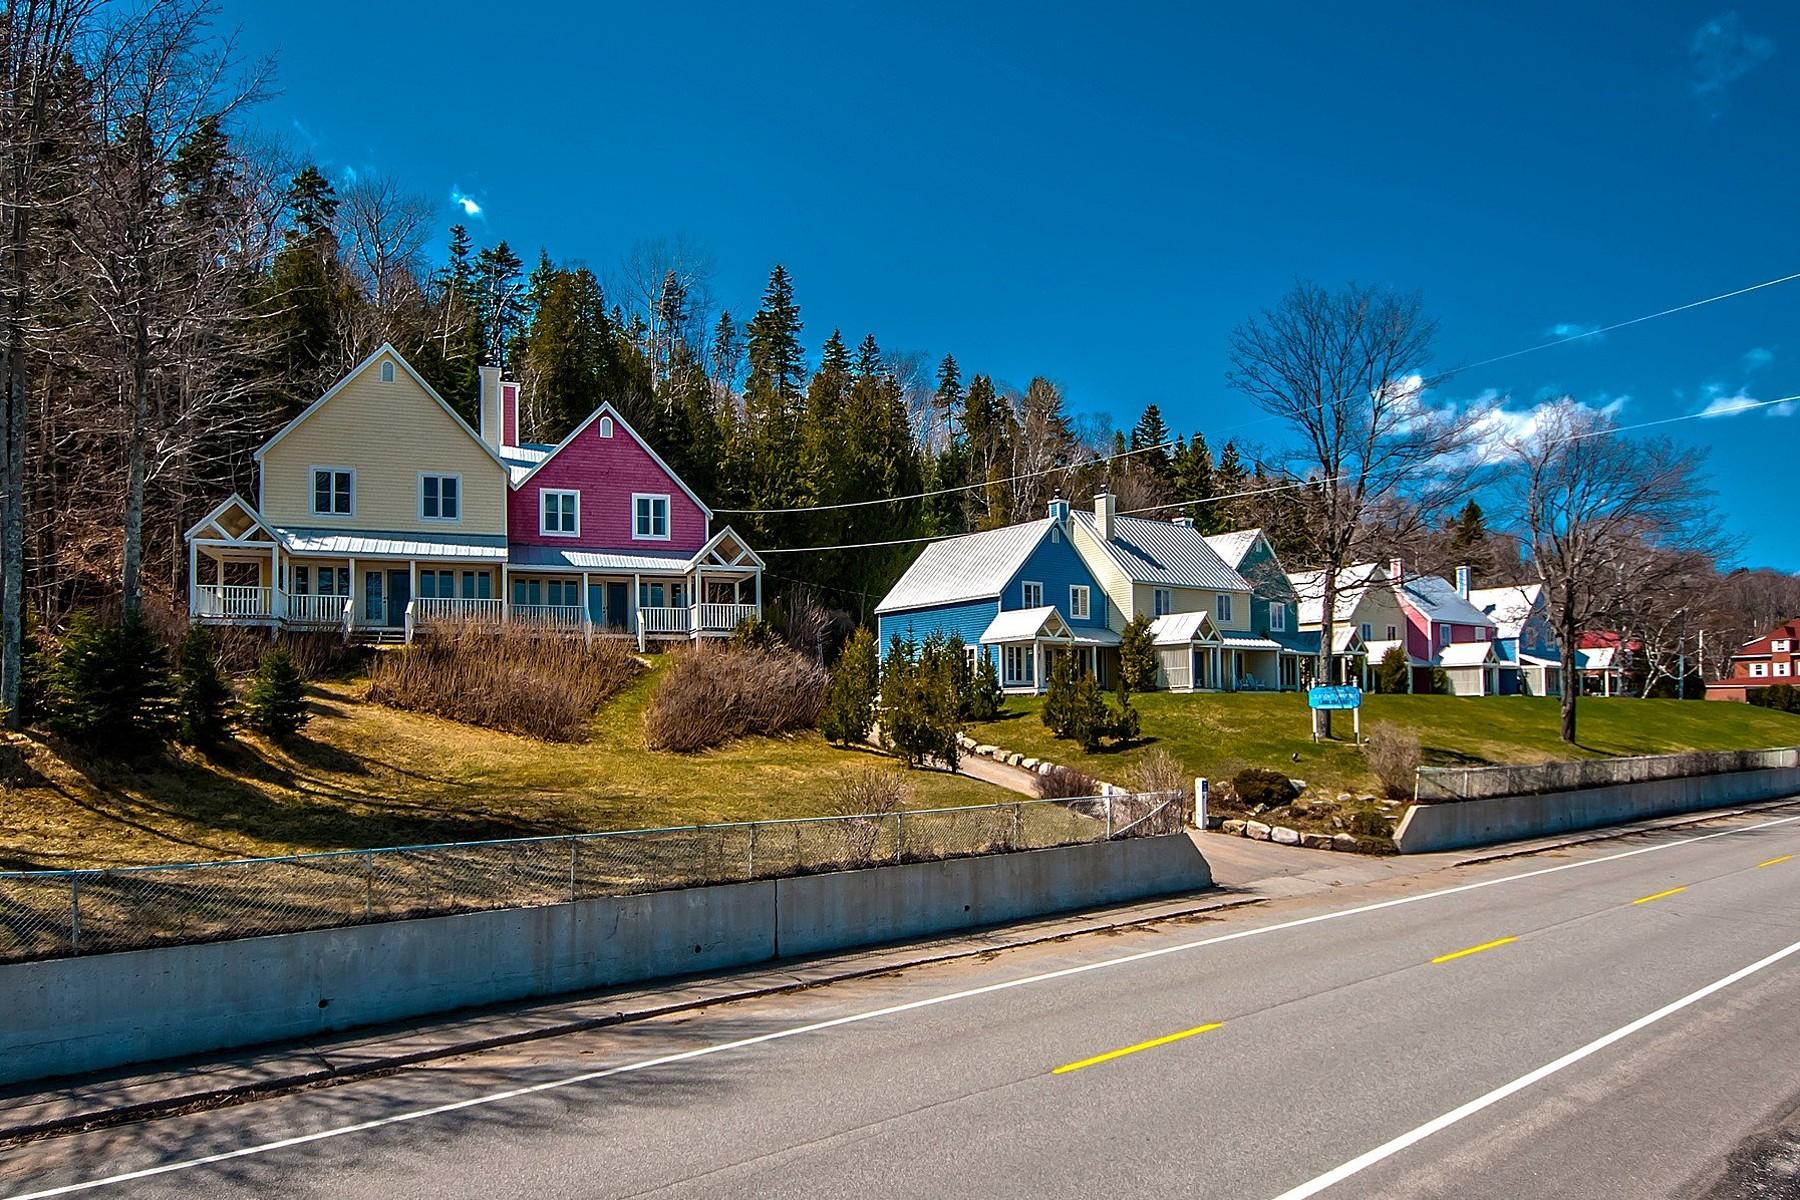 Các loại nhà khác vì Bán tại Saint-Irénée, Capitale-Nationale 290304 Ch. des Bains Saint-Irenee, Quebec G0T1V0 Canada